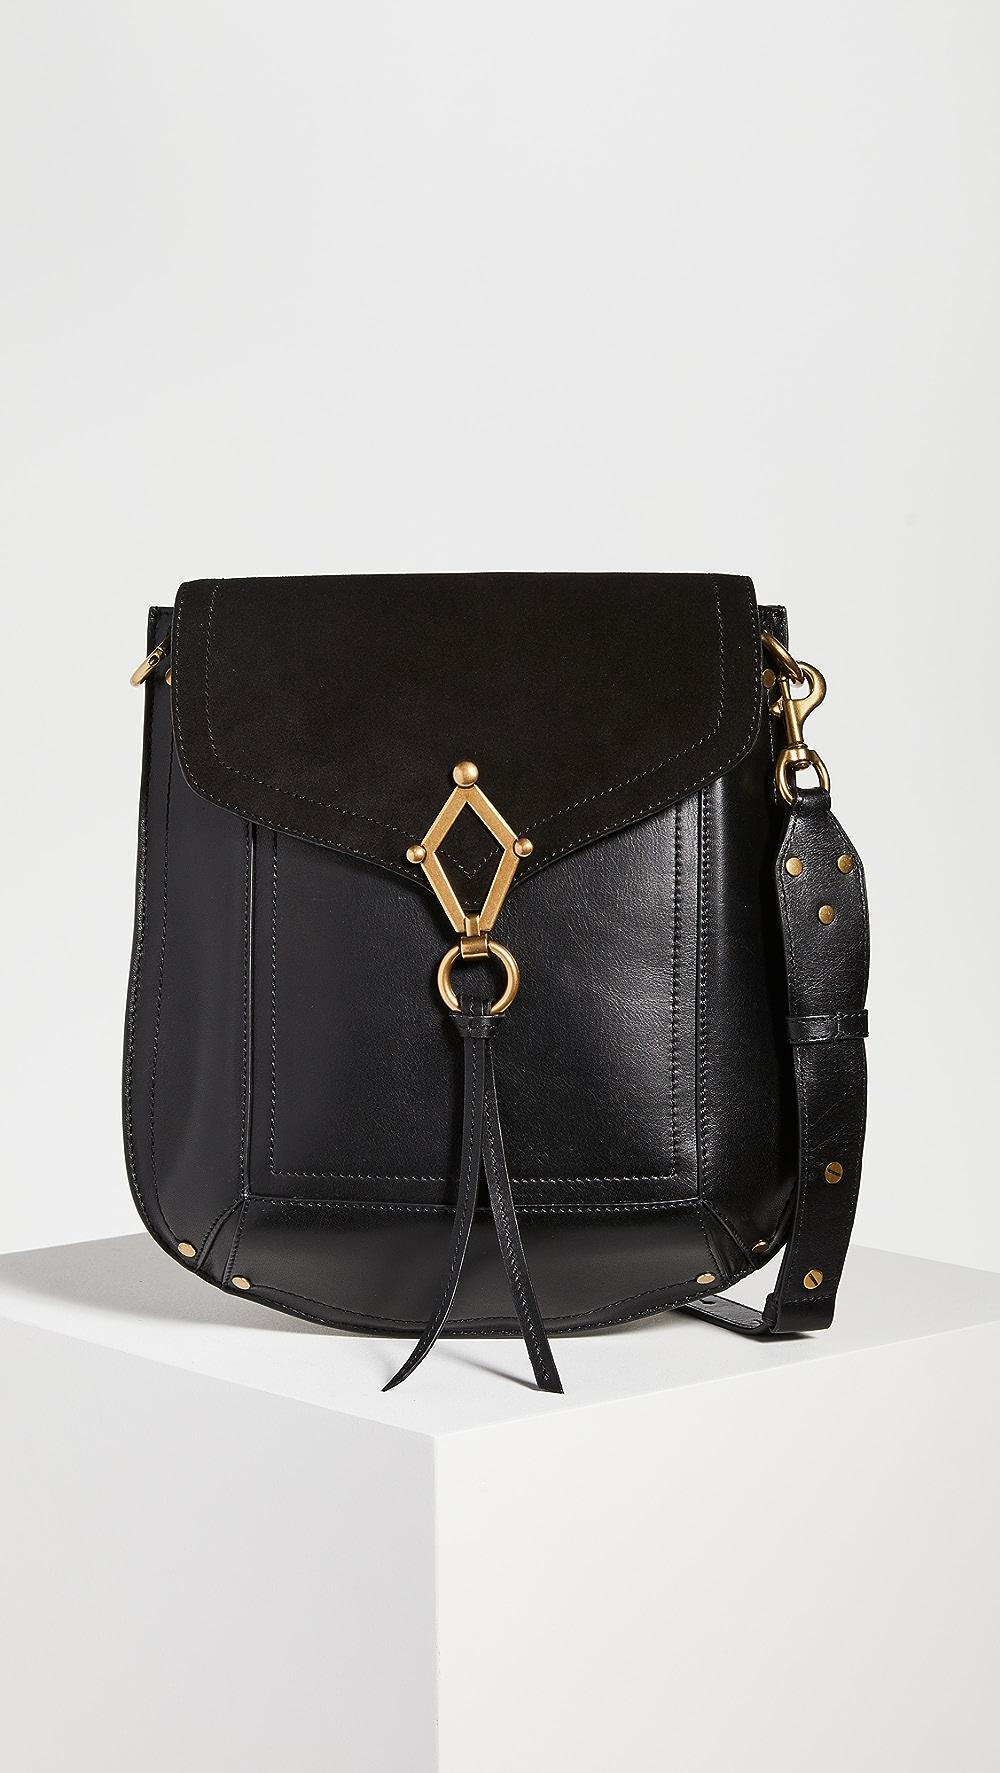 Alert Isabel Marant - Roska Bag Rich In Poetic And Pictorial Splendor